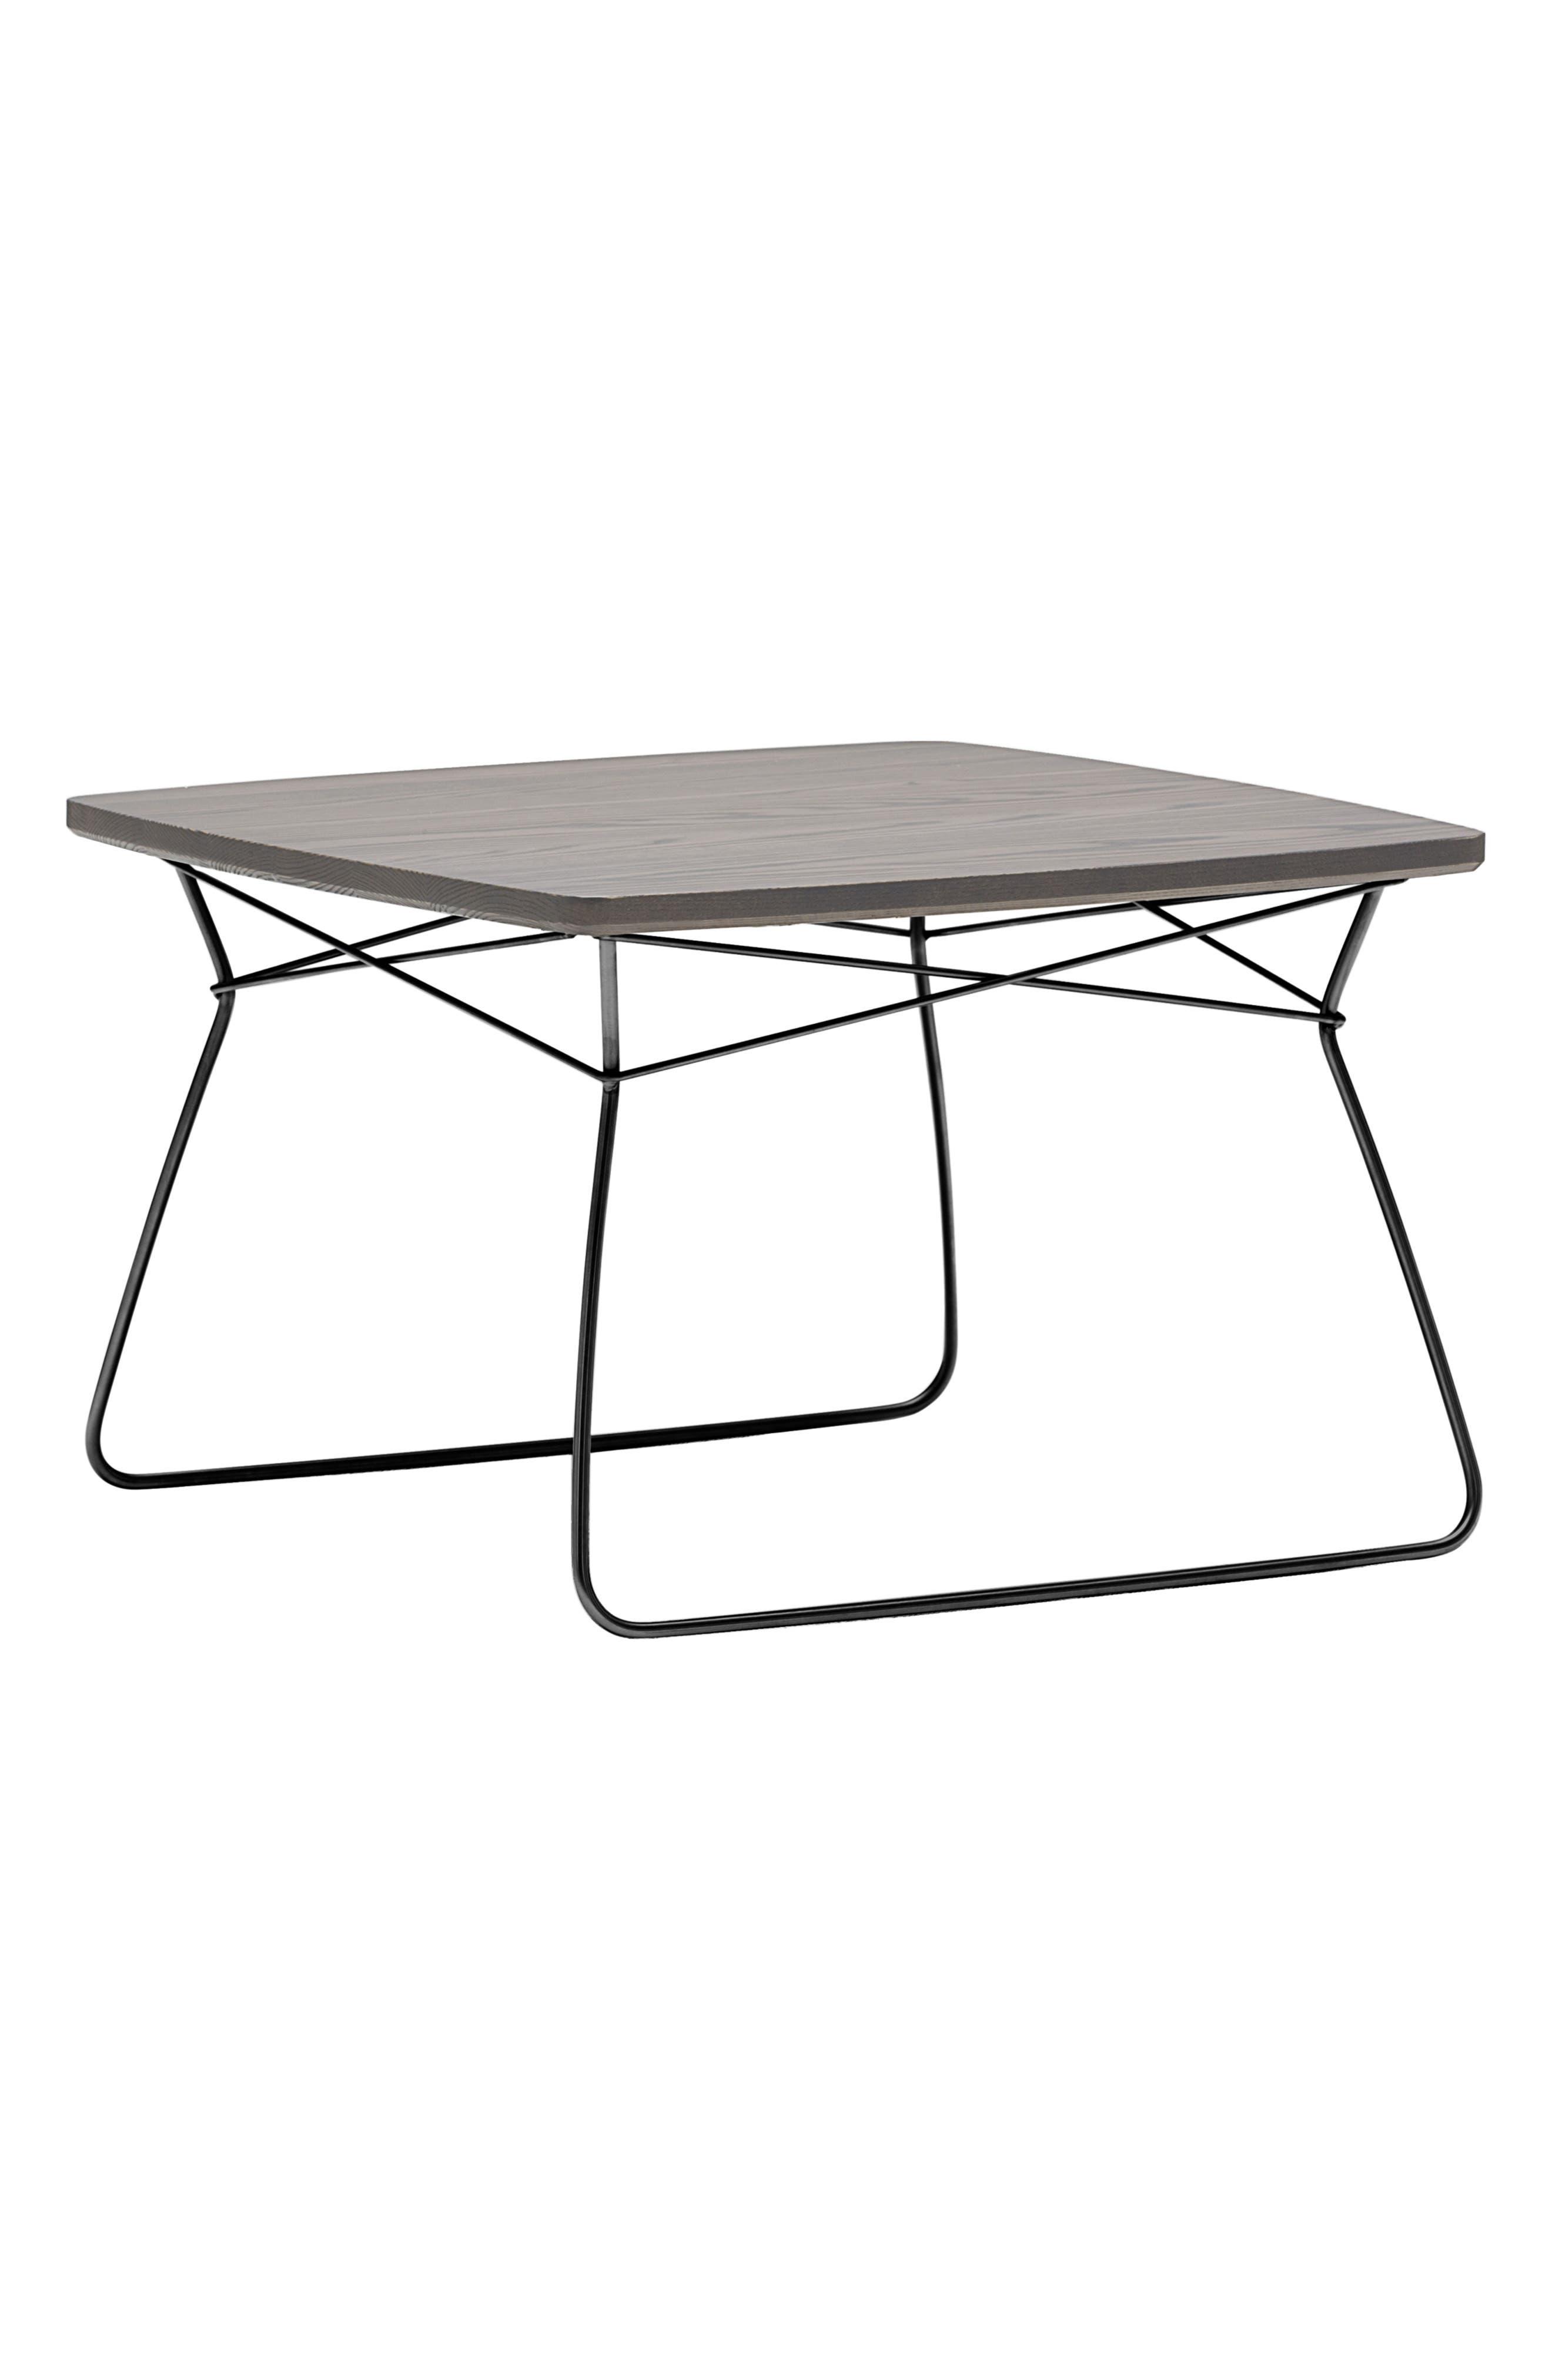 Main Image - Design on Stock USA Dalt Side Table